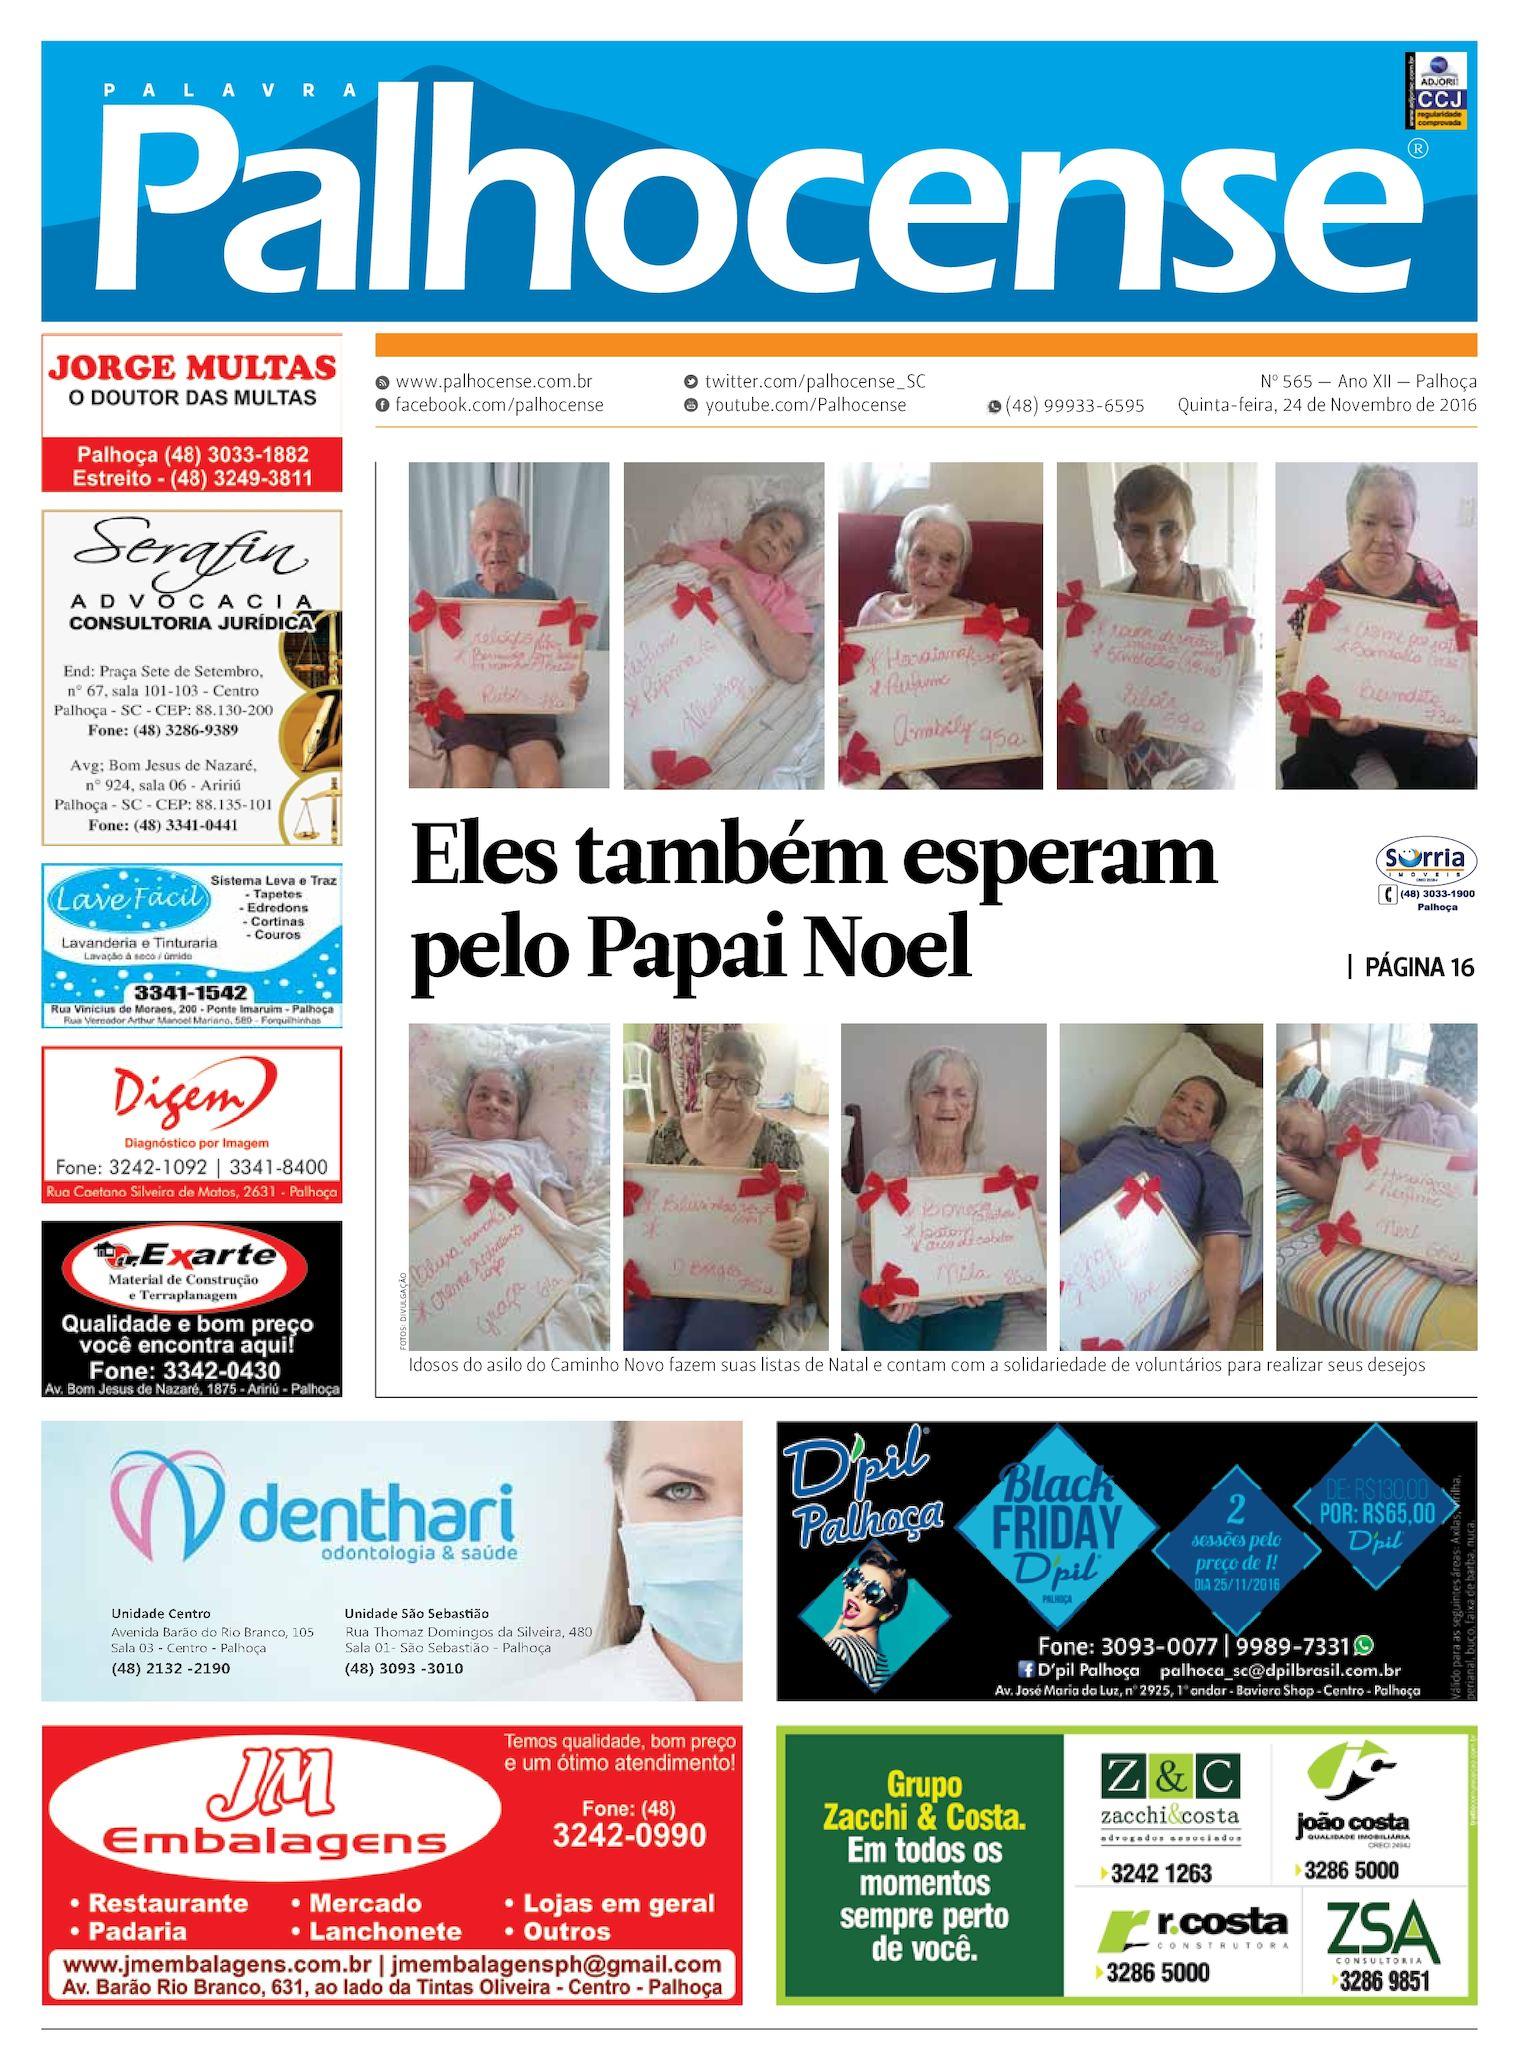 Calaméo - Jornal Palavra Palhocense - EDIÇÃO 565 d036ef8438